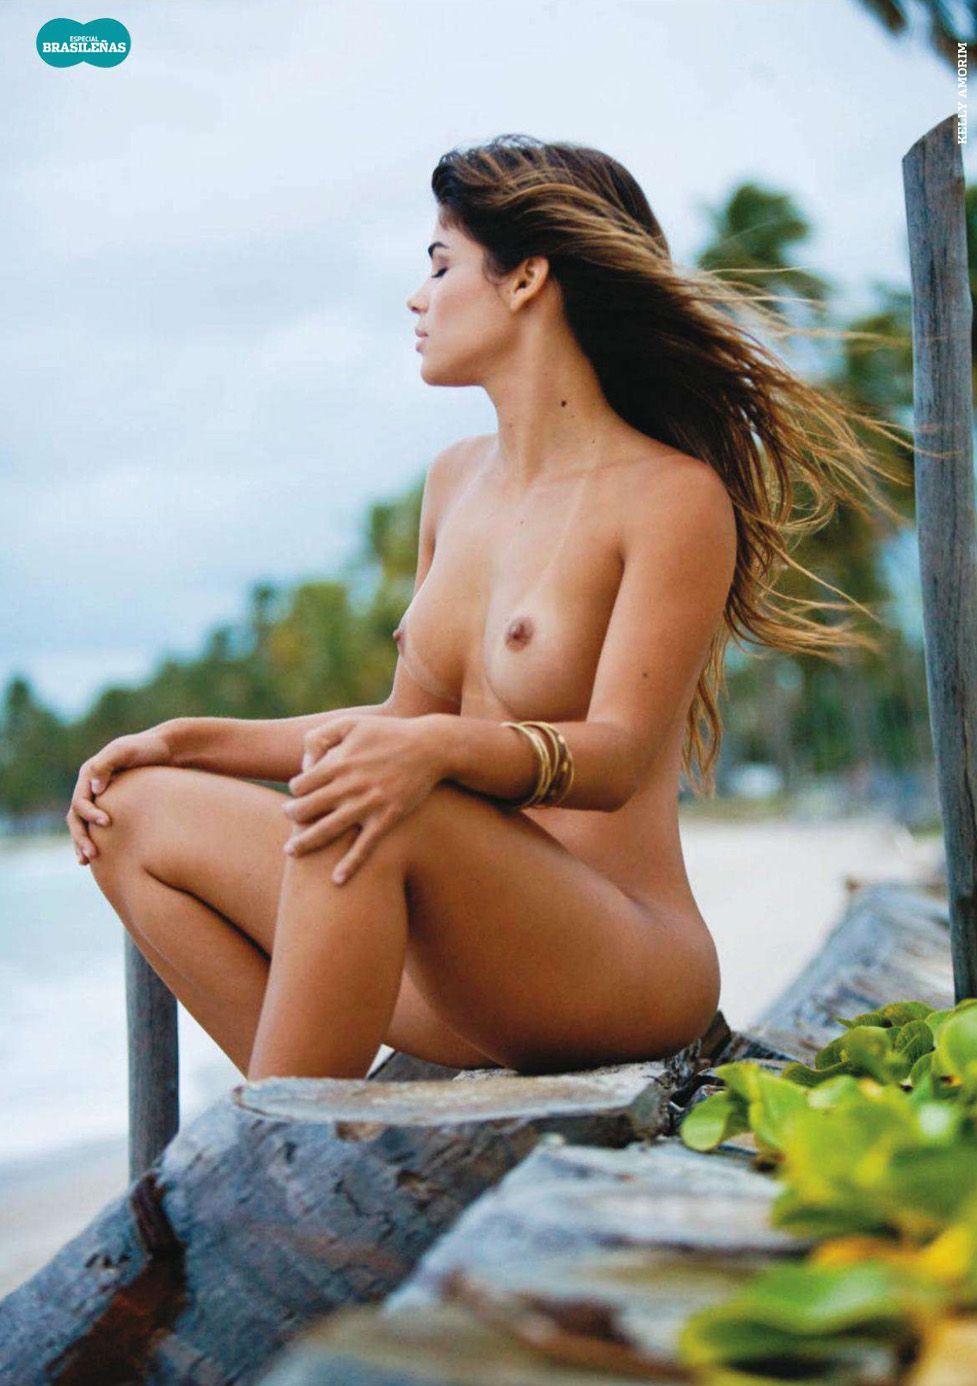 бразильские девушки / Especial Brasilenas in Playboy Spain january 2011 - Kelly Amorim